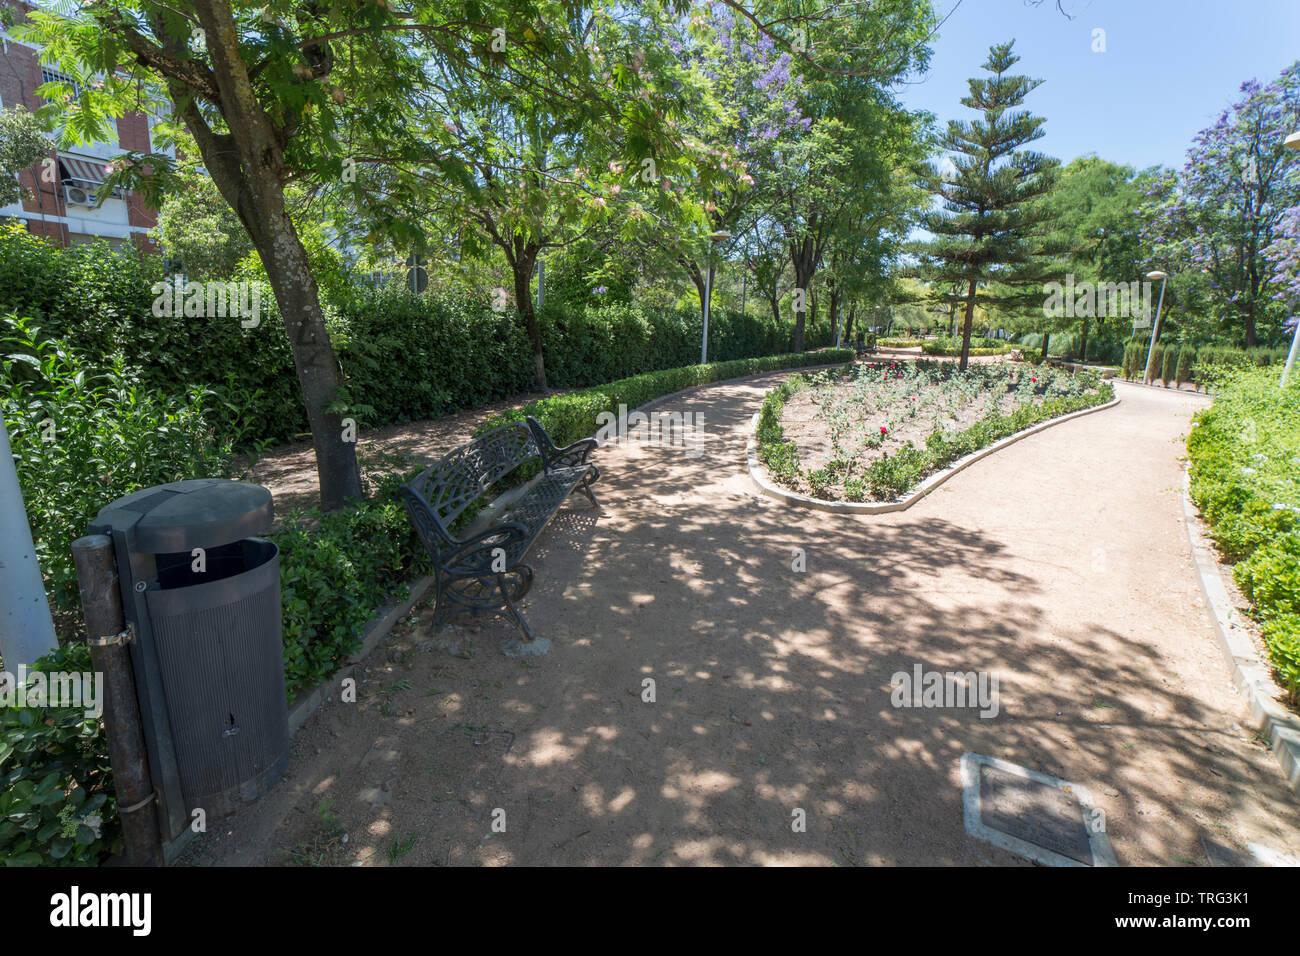 Cordoba, Spain - May 30th, 2019: Norte Sierra district. Cordoba, Spain. San Rafael gardens - Stock Image